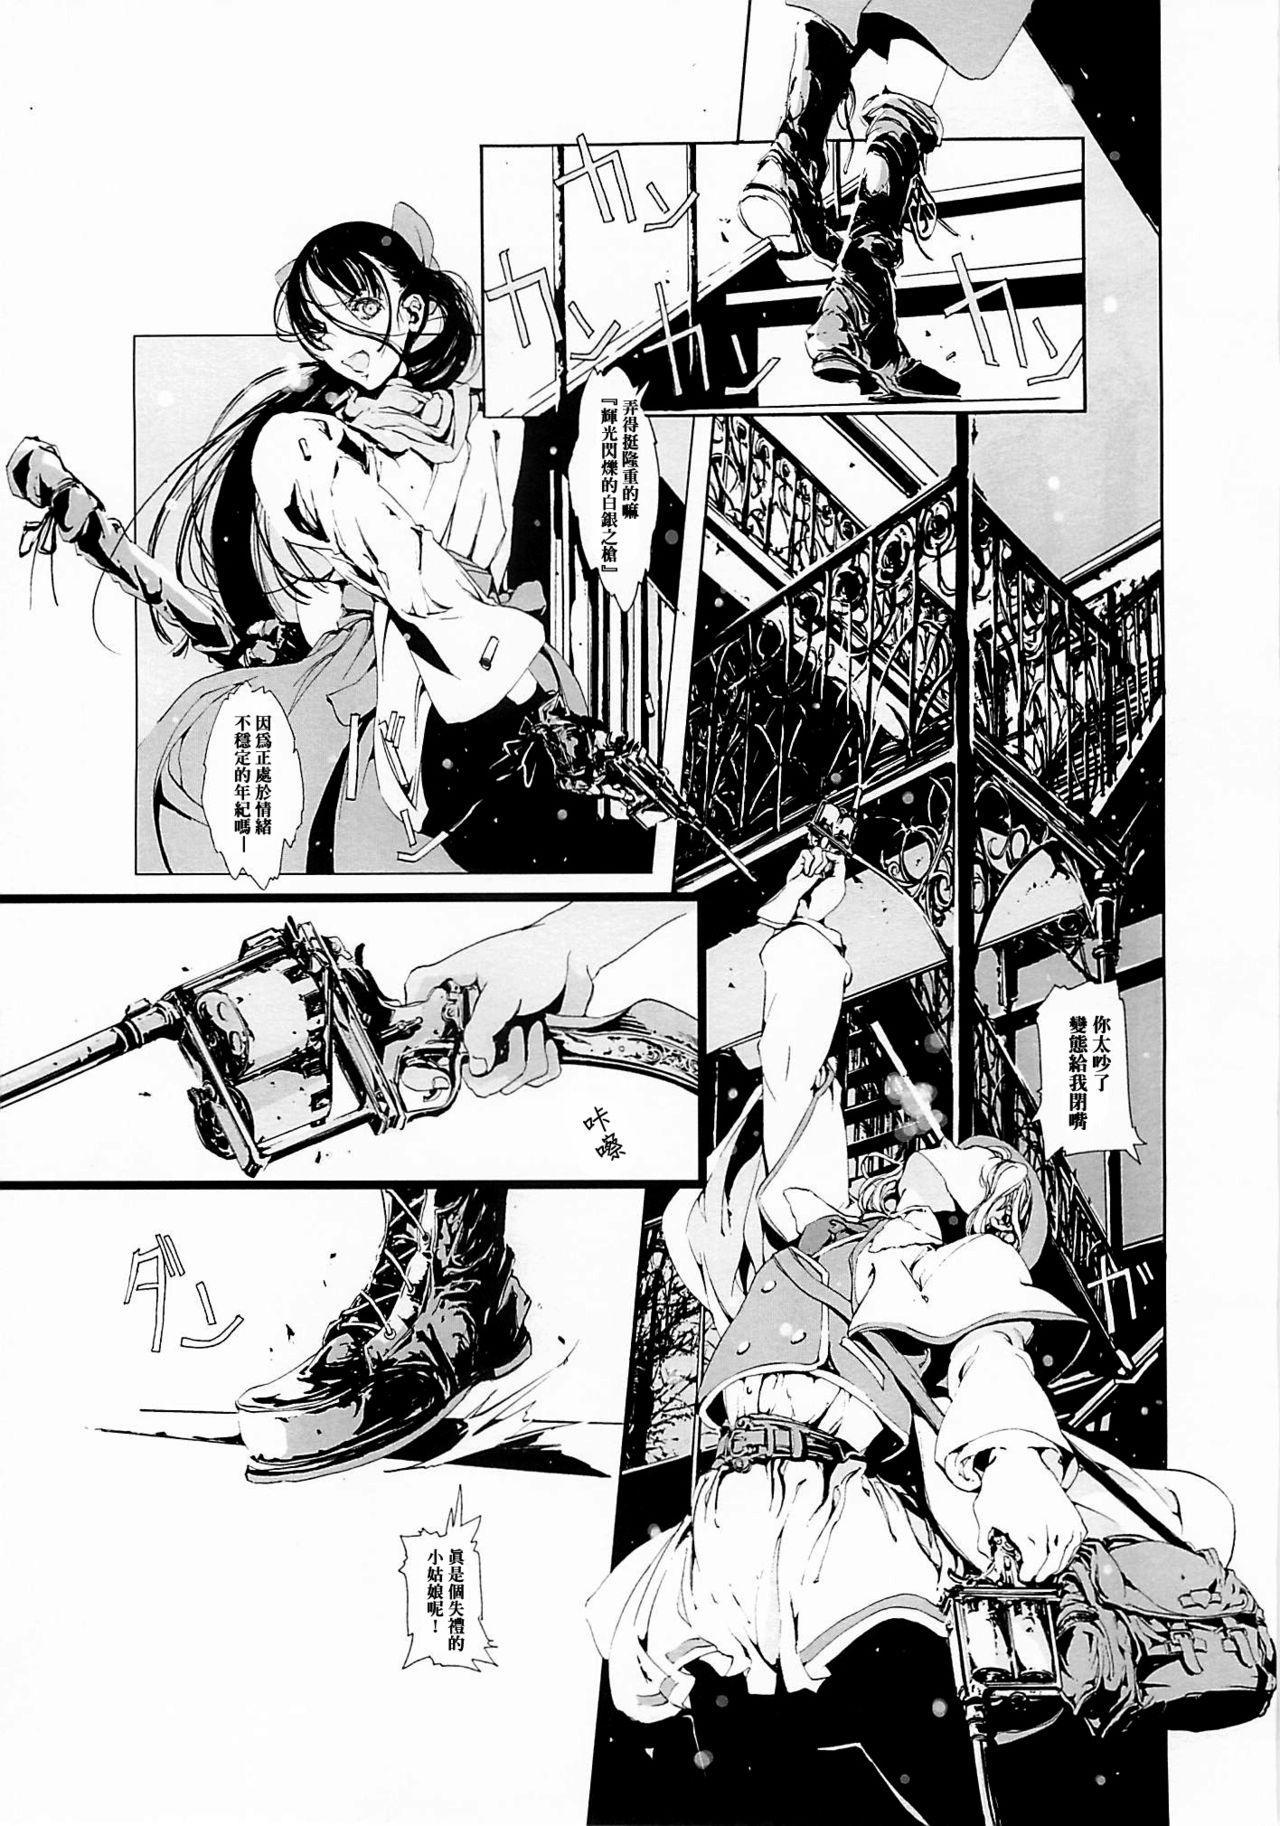 (CR37) [70 Nenshiki Yuukyuu Kikan (Endou Okito)] ORGAN-Tino  01-02[Chinese] [拾荒者汉化组] [Incomplete] 49